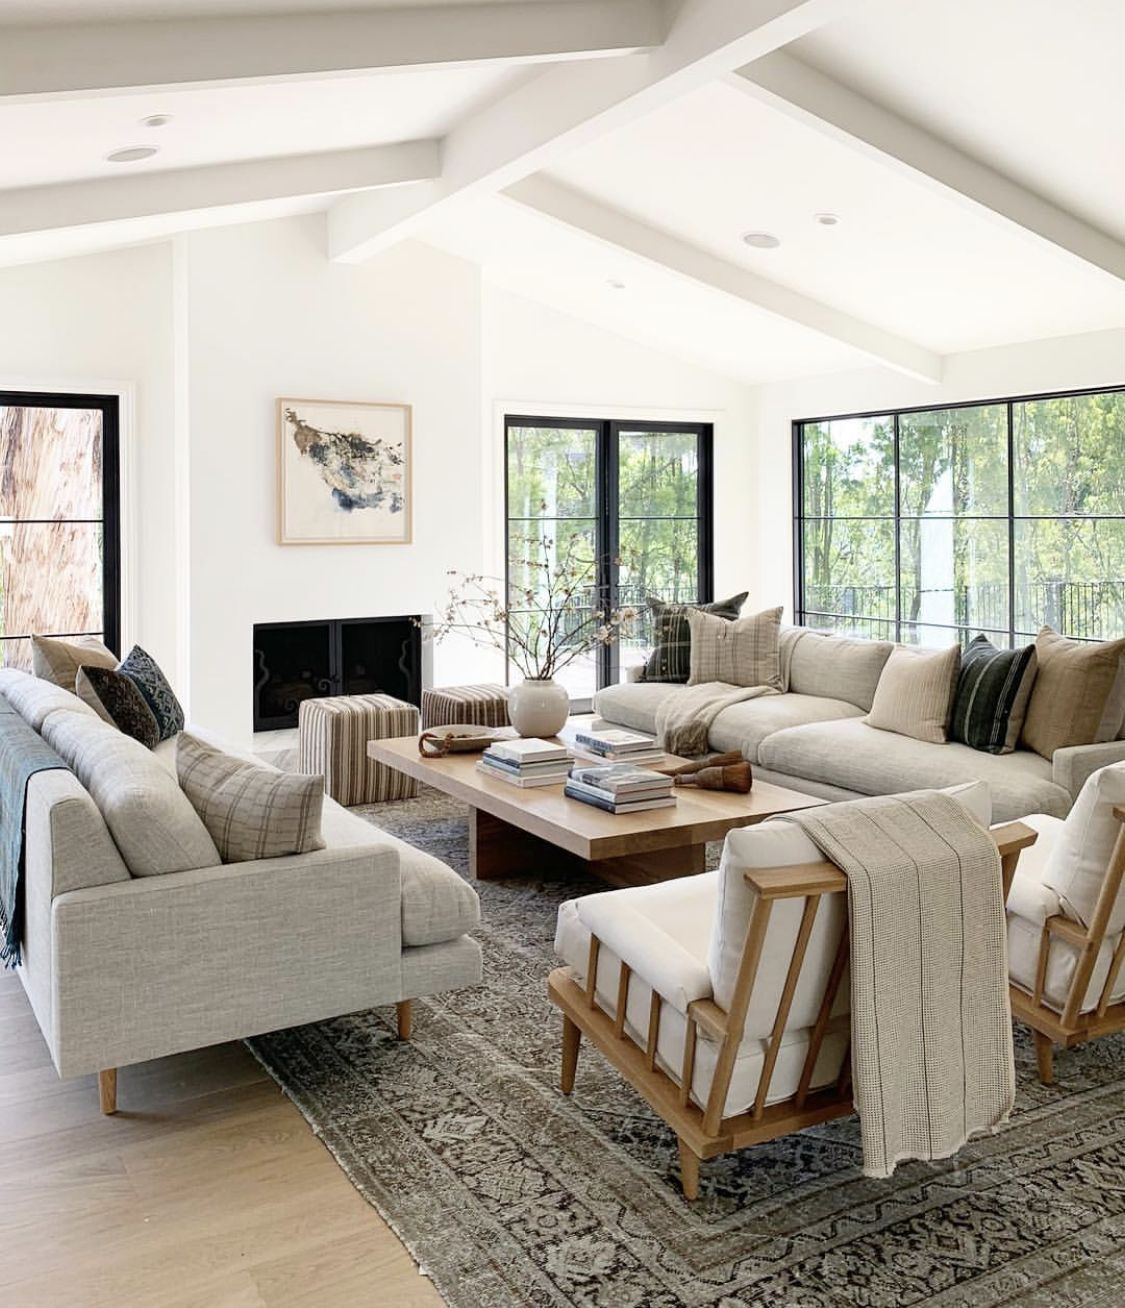 Used Black Living Room Furniture #homeinterior #FurnitureLivingRoomChairs